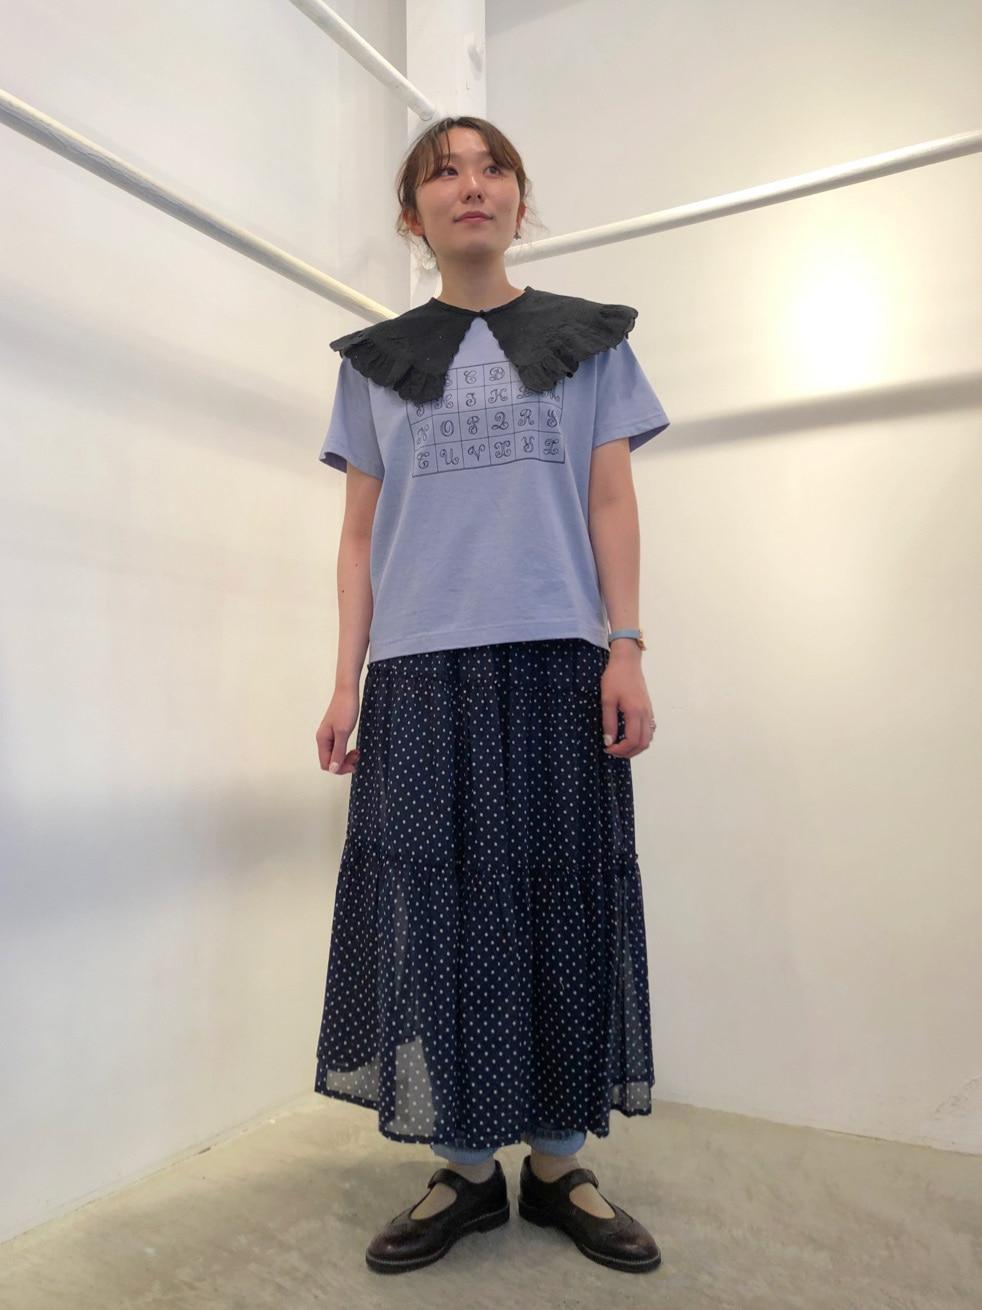 Malle chambre de charme ルミネ新宿 身長:163cm 2021.05.21